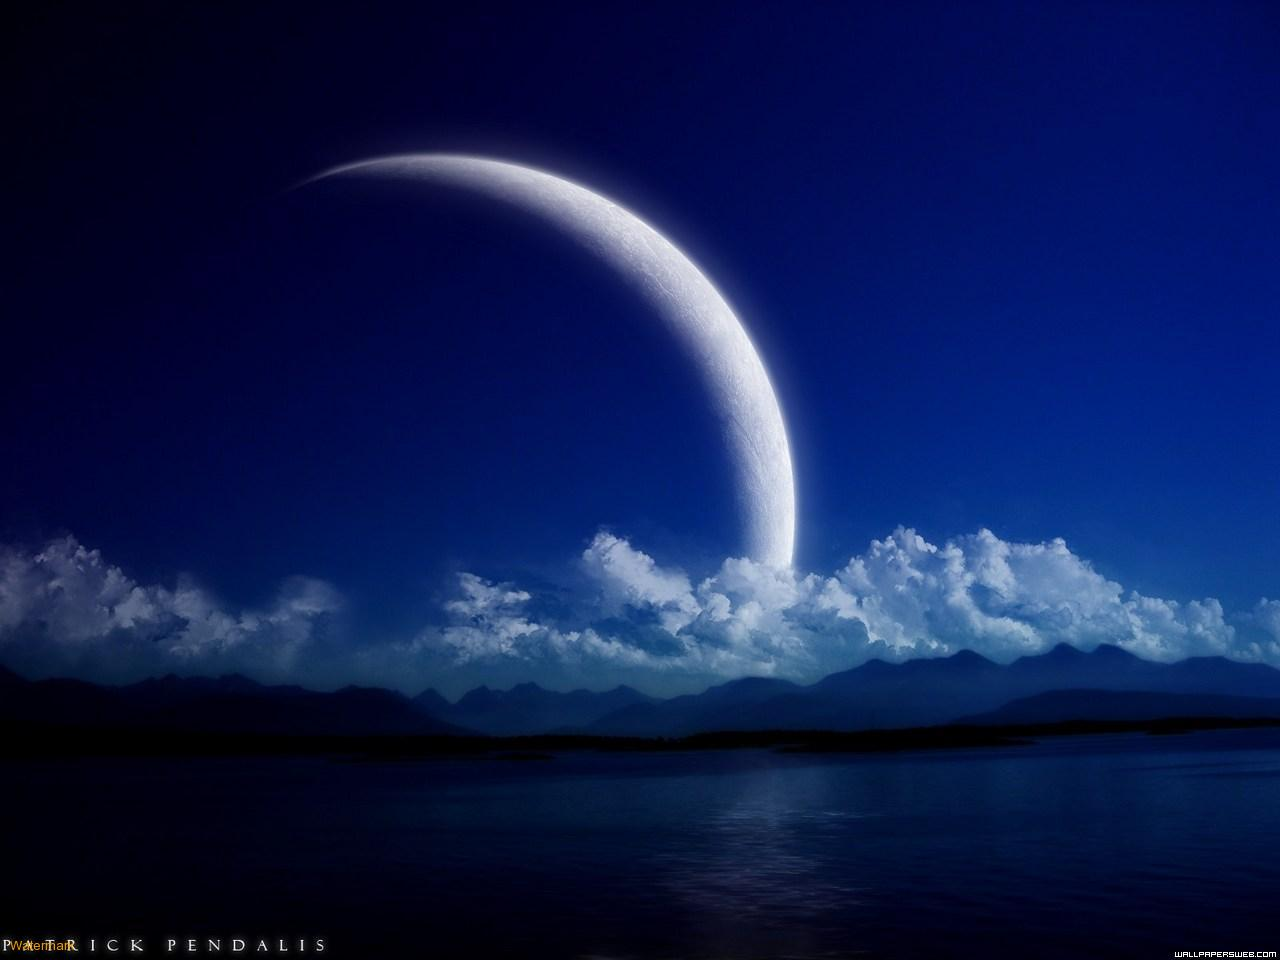 http://3.bp.blogspot.com/-6XsE8ZVMdPQ/TwKeW3avOTI/AAAAAAAABHk/vl8lofCwL5Q/s1600/Moon-Wallpapers-05.jpeg